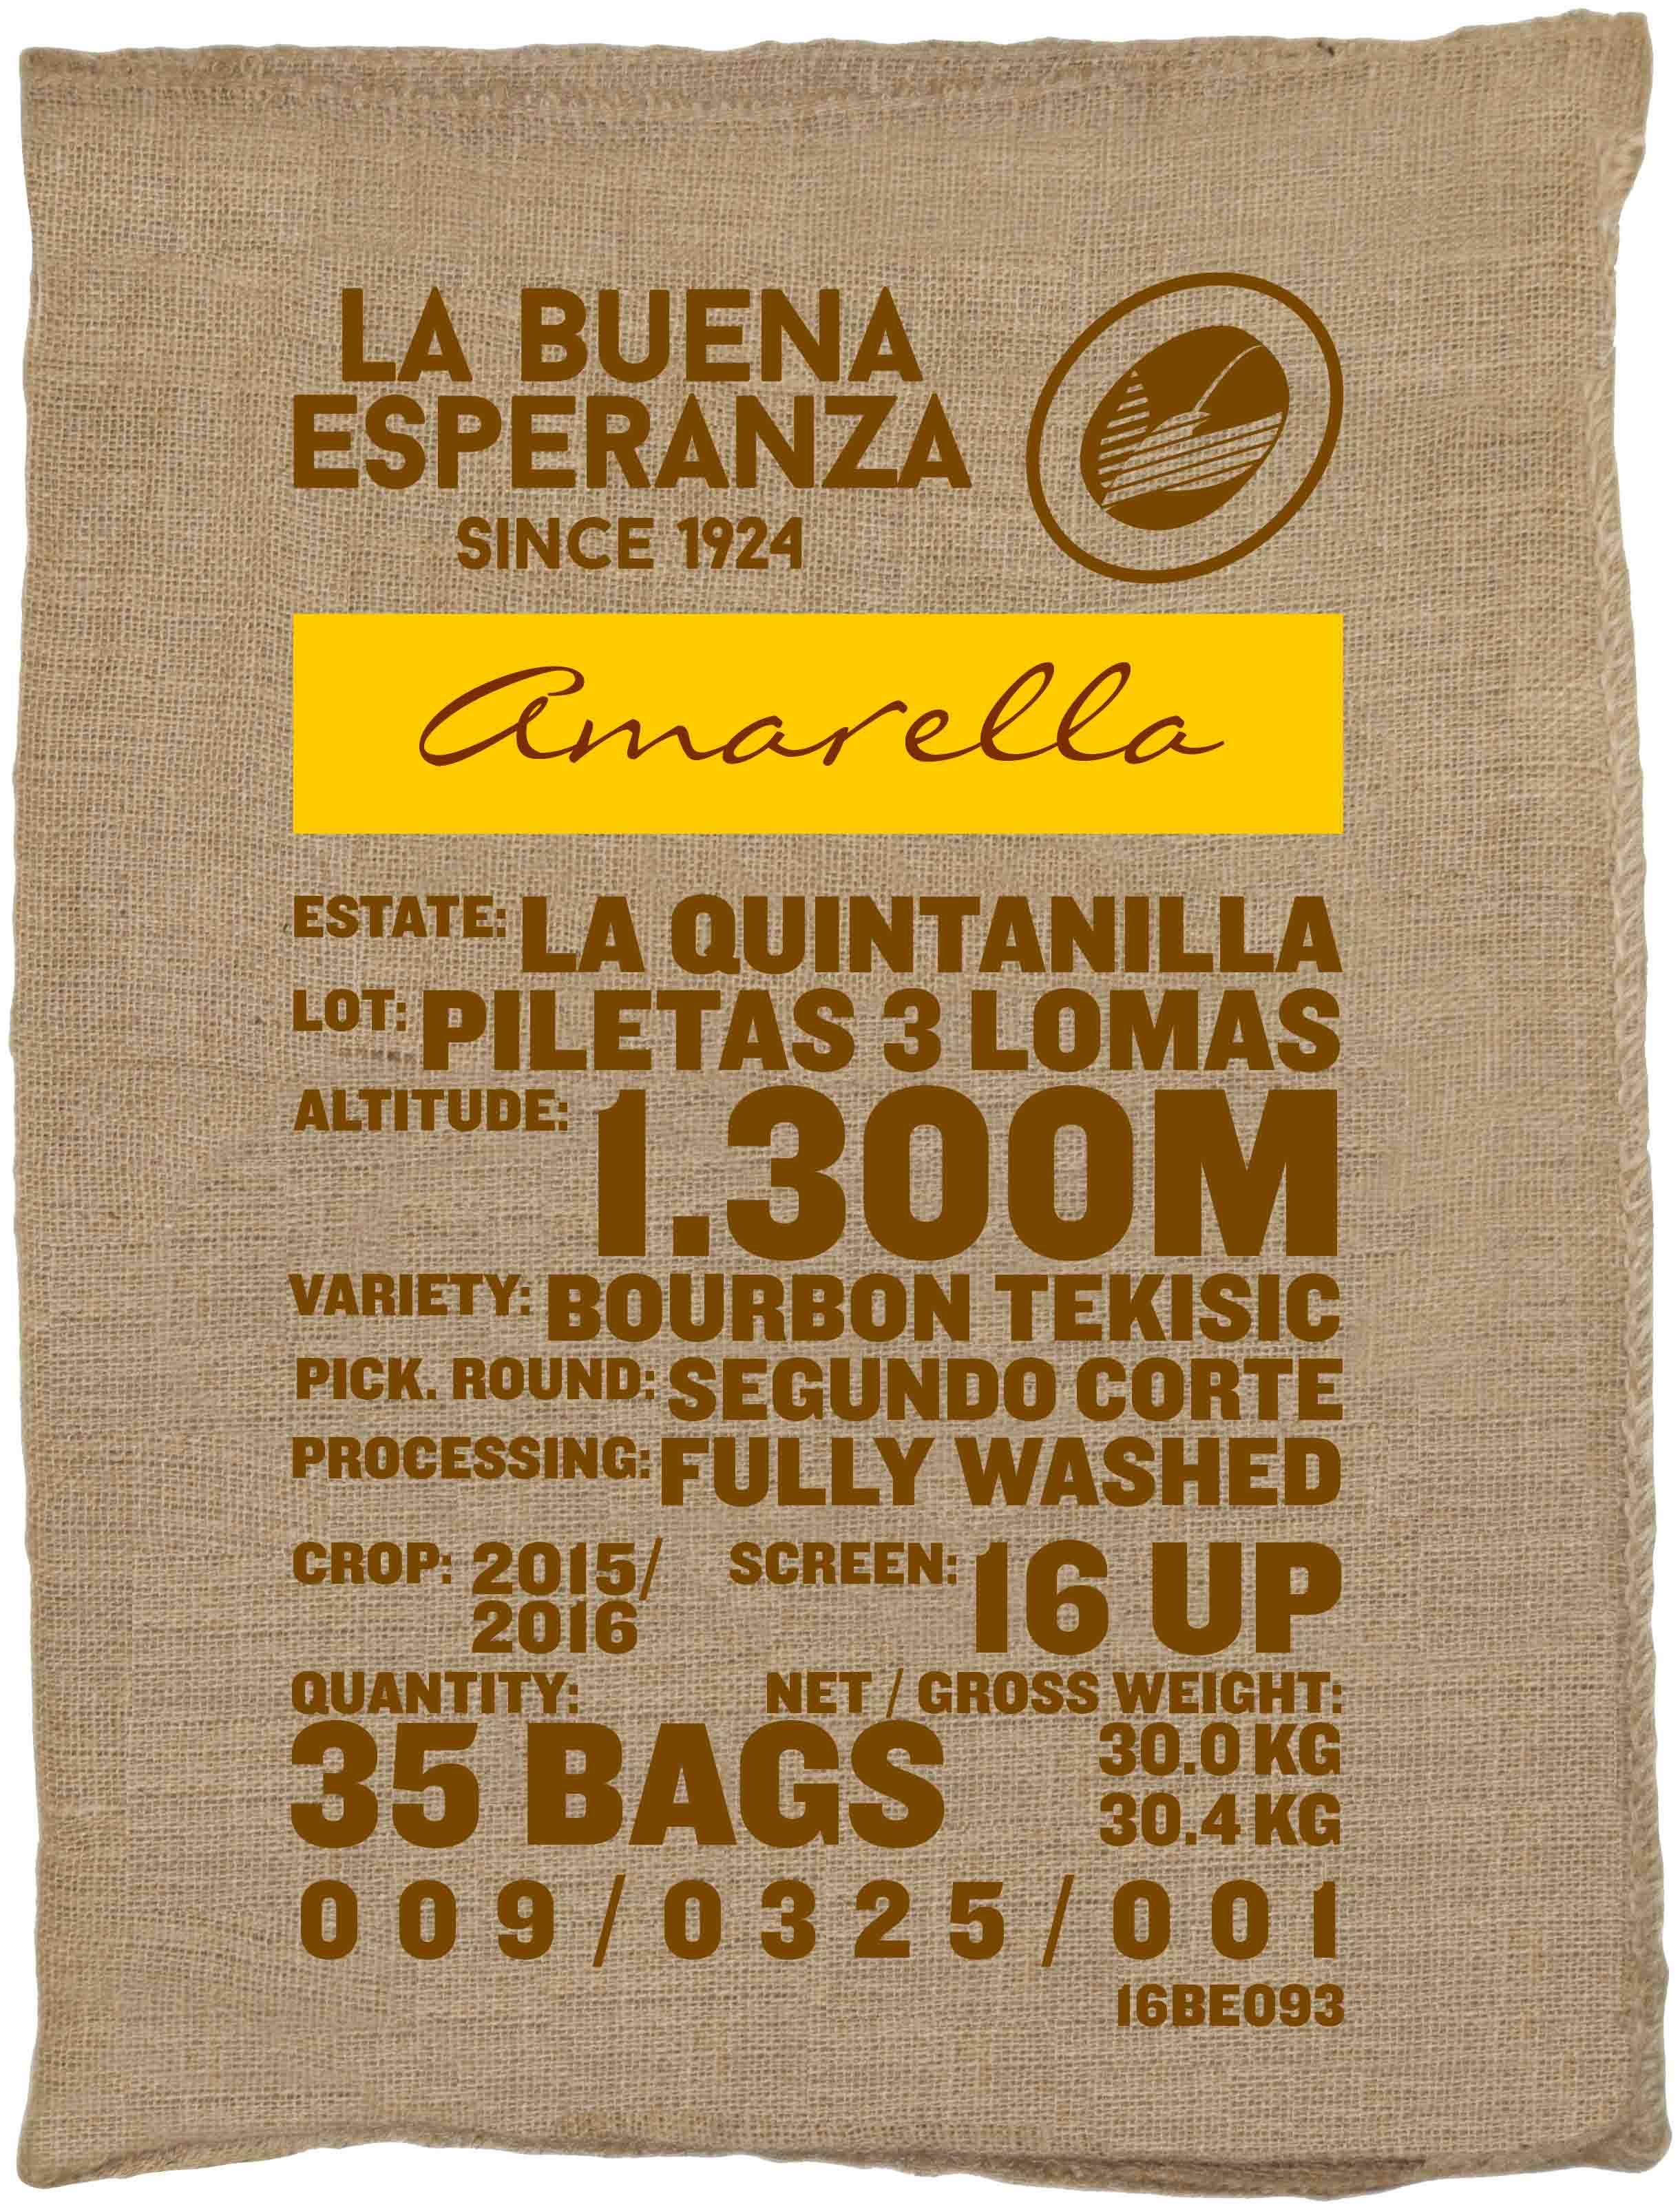 Ein Rohkaffeesack amarella Parzellenkaffee Varietät Bourbon Tekisic . Finca La Buena Esperanza Lot Piletas 3 Lomas.